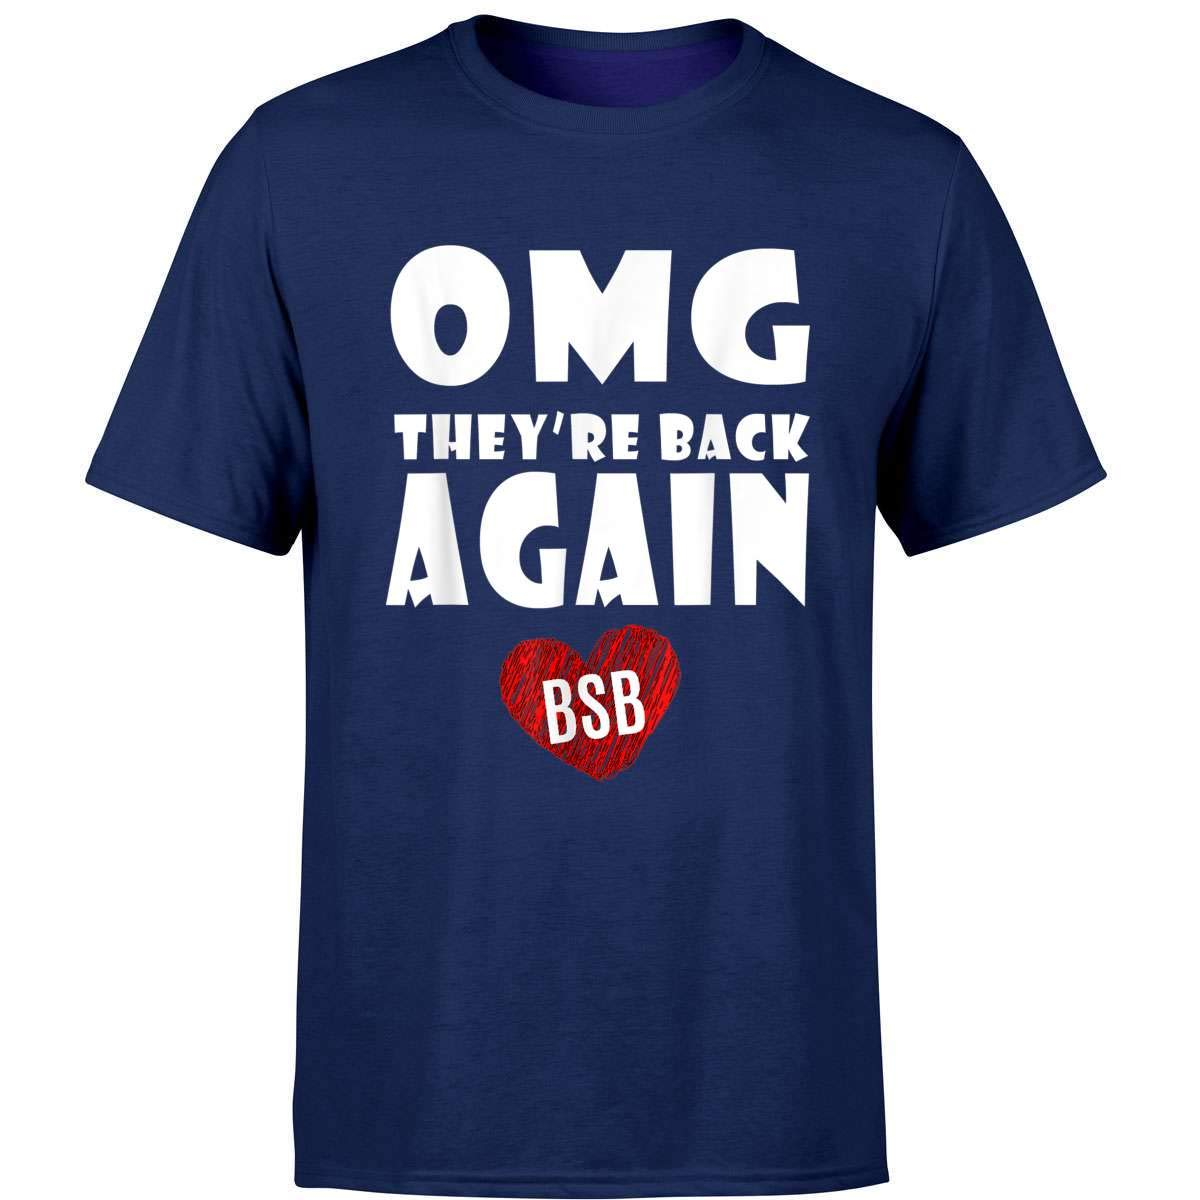 Boxbox Omg They Re Back Again Tshirt Backstreet Great T Shirt